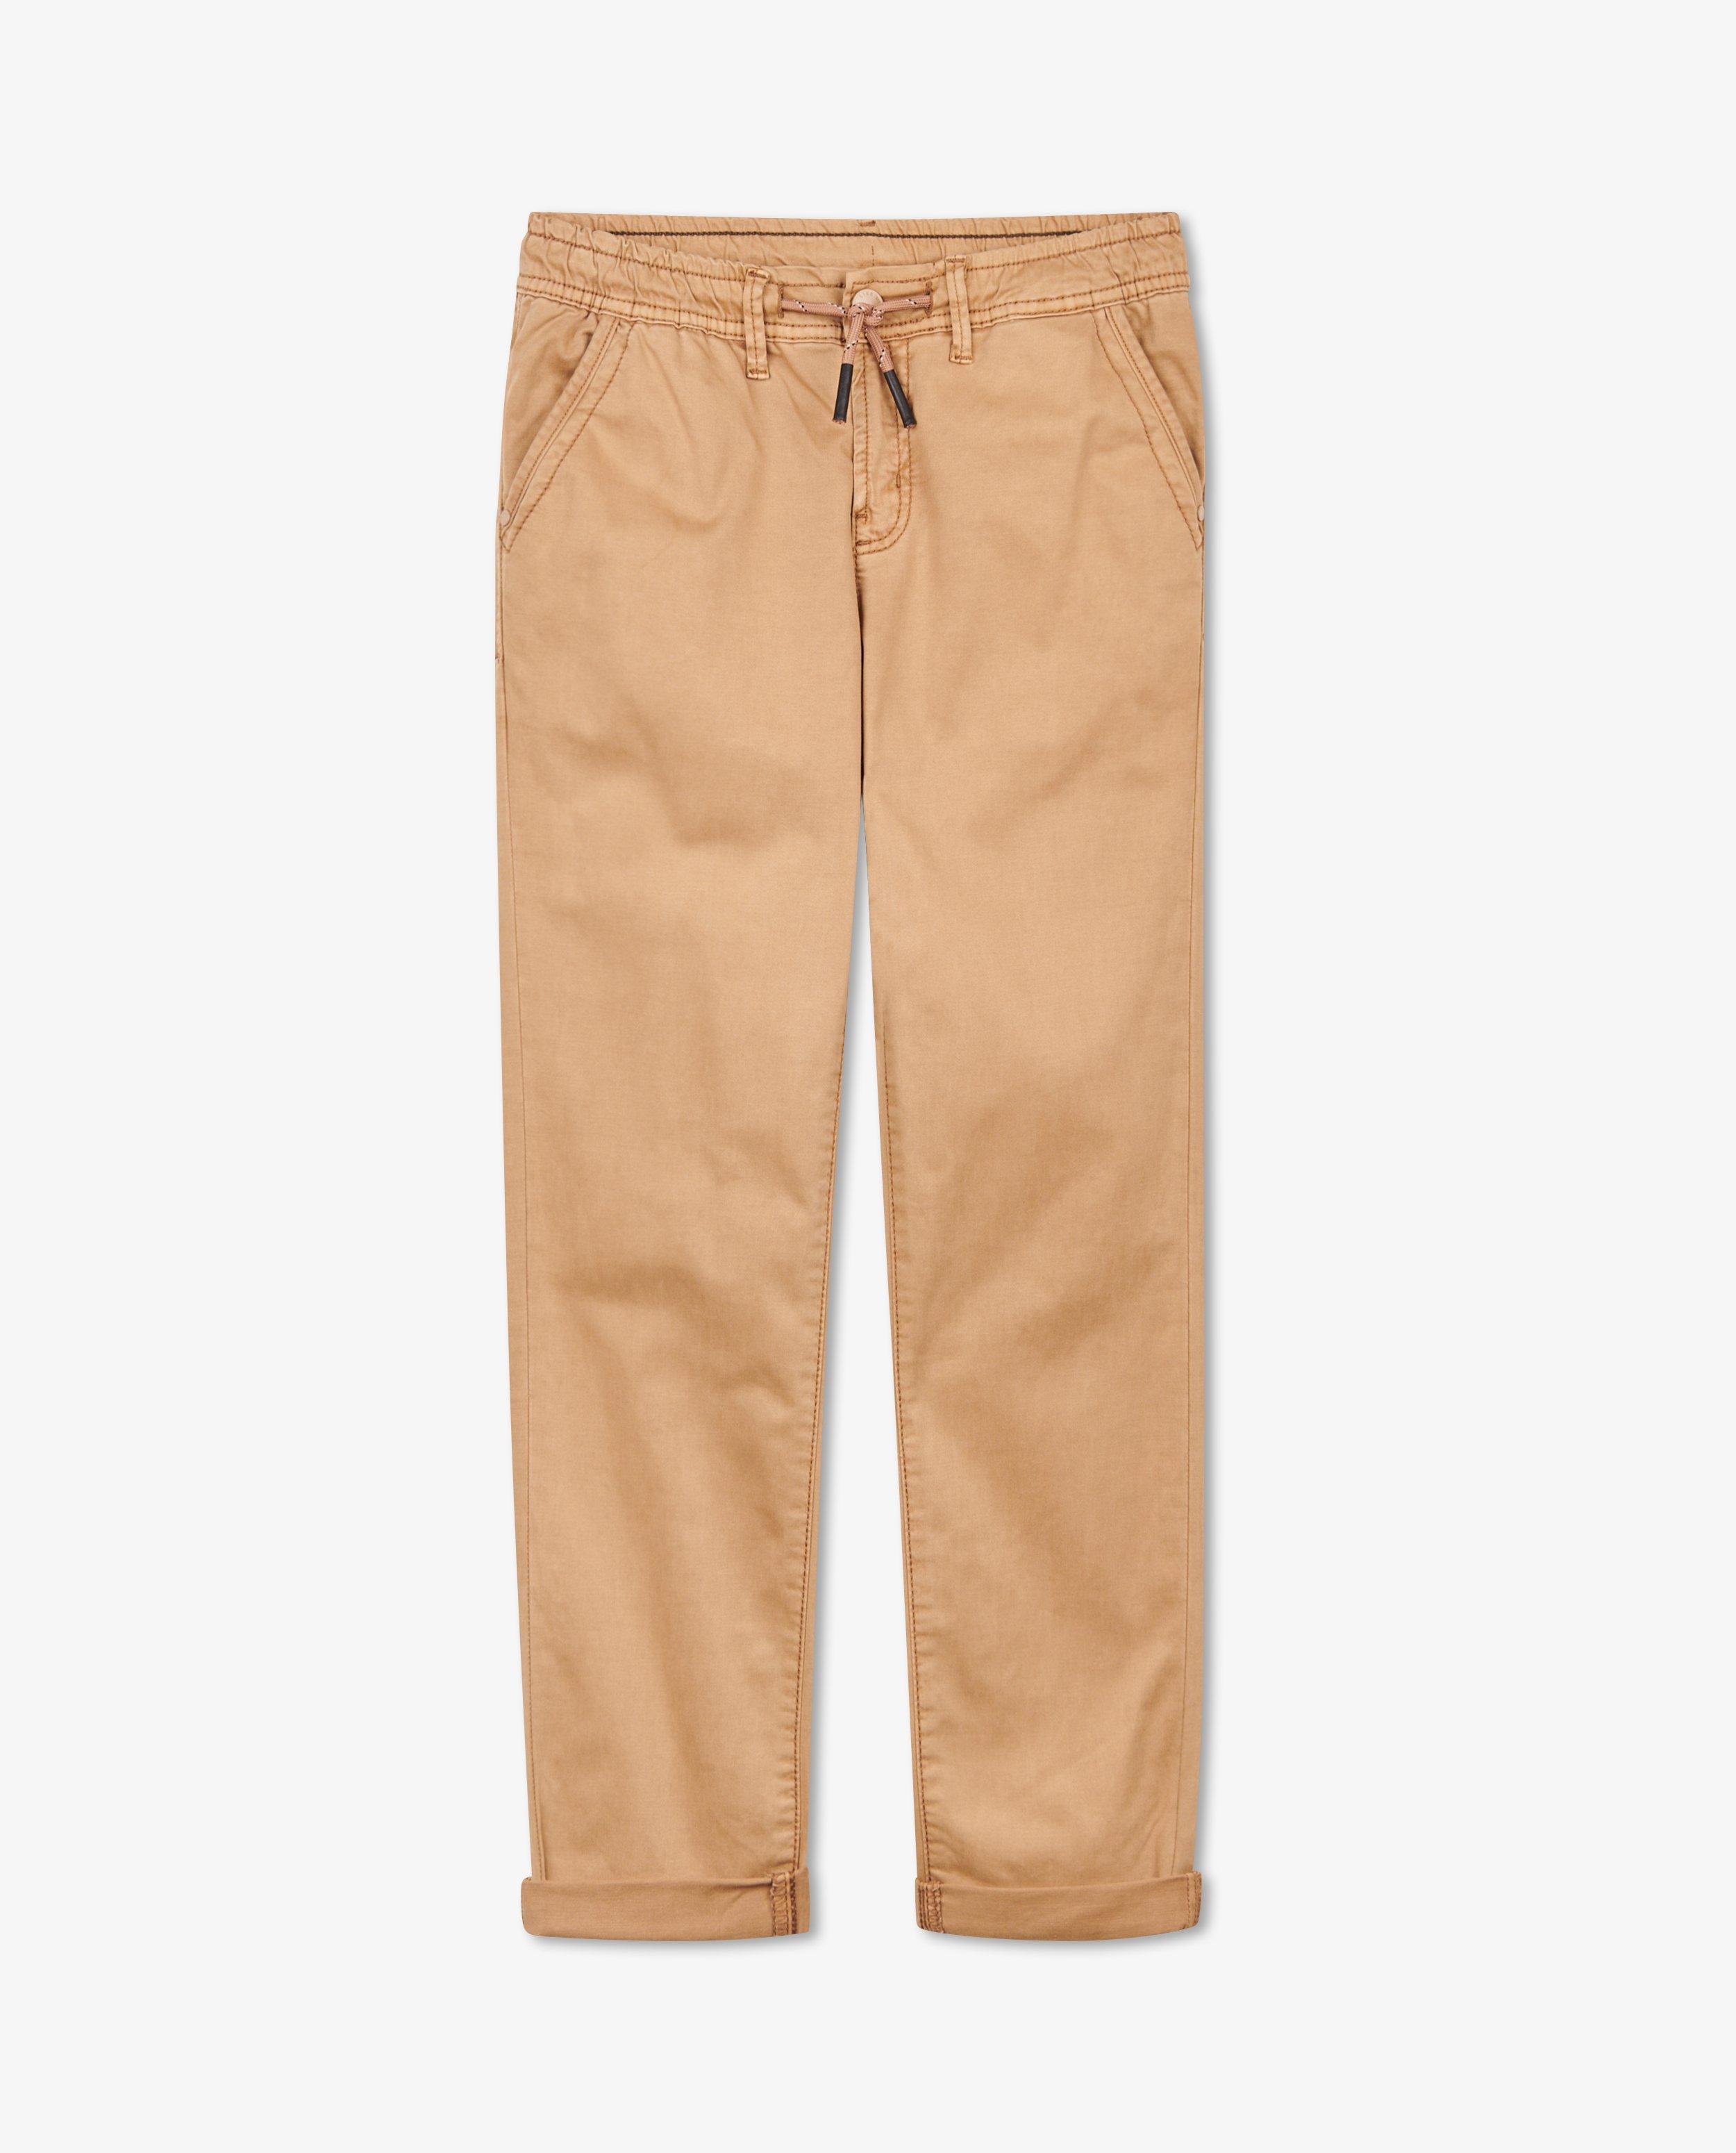 Pantalon brun #LikeMe